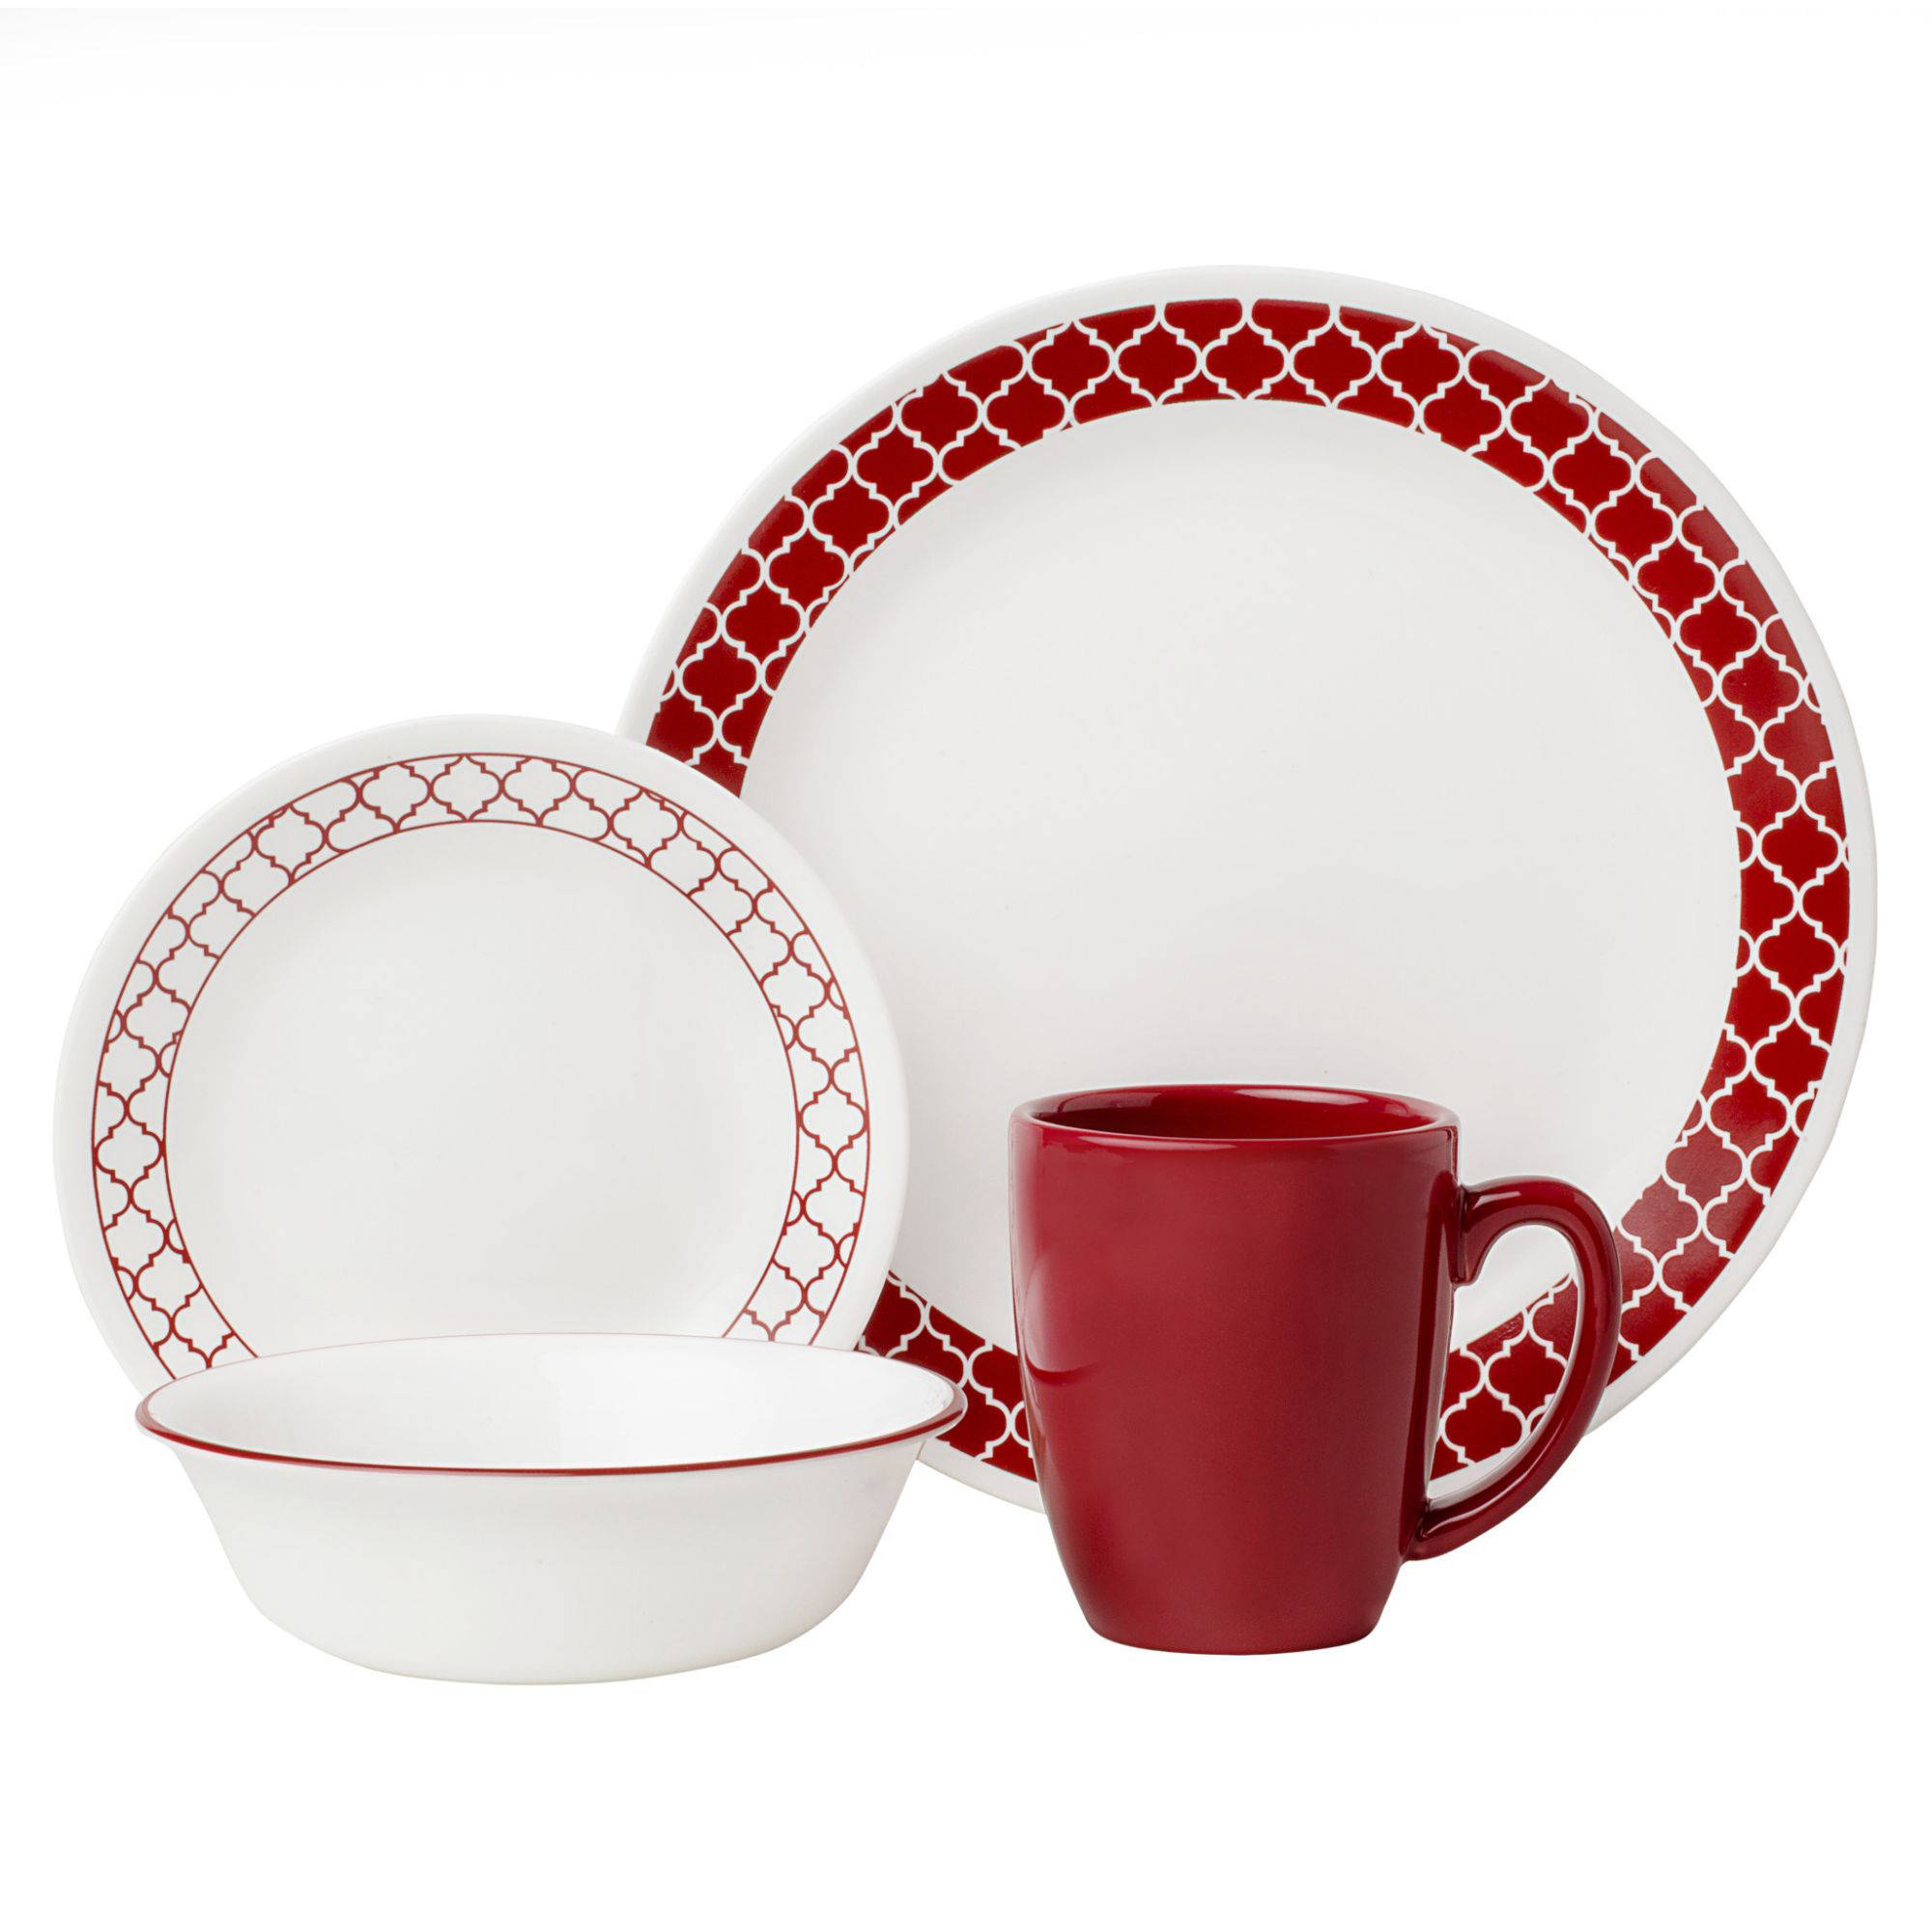 sc 1 st  Walmart & Corelle Livingware Crimson Trellis 16-Piece Dinnerware Set - Walmart.com